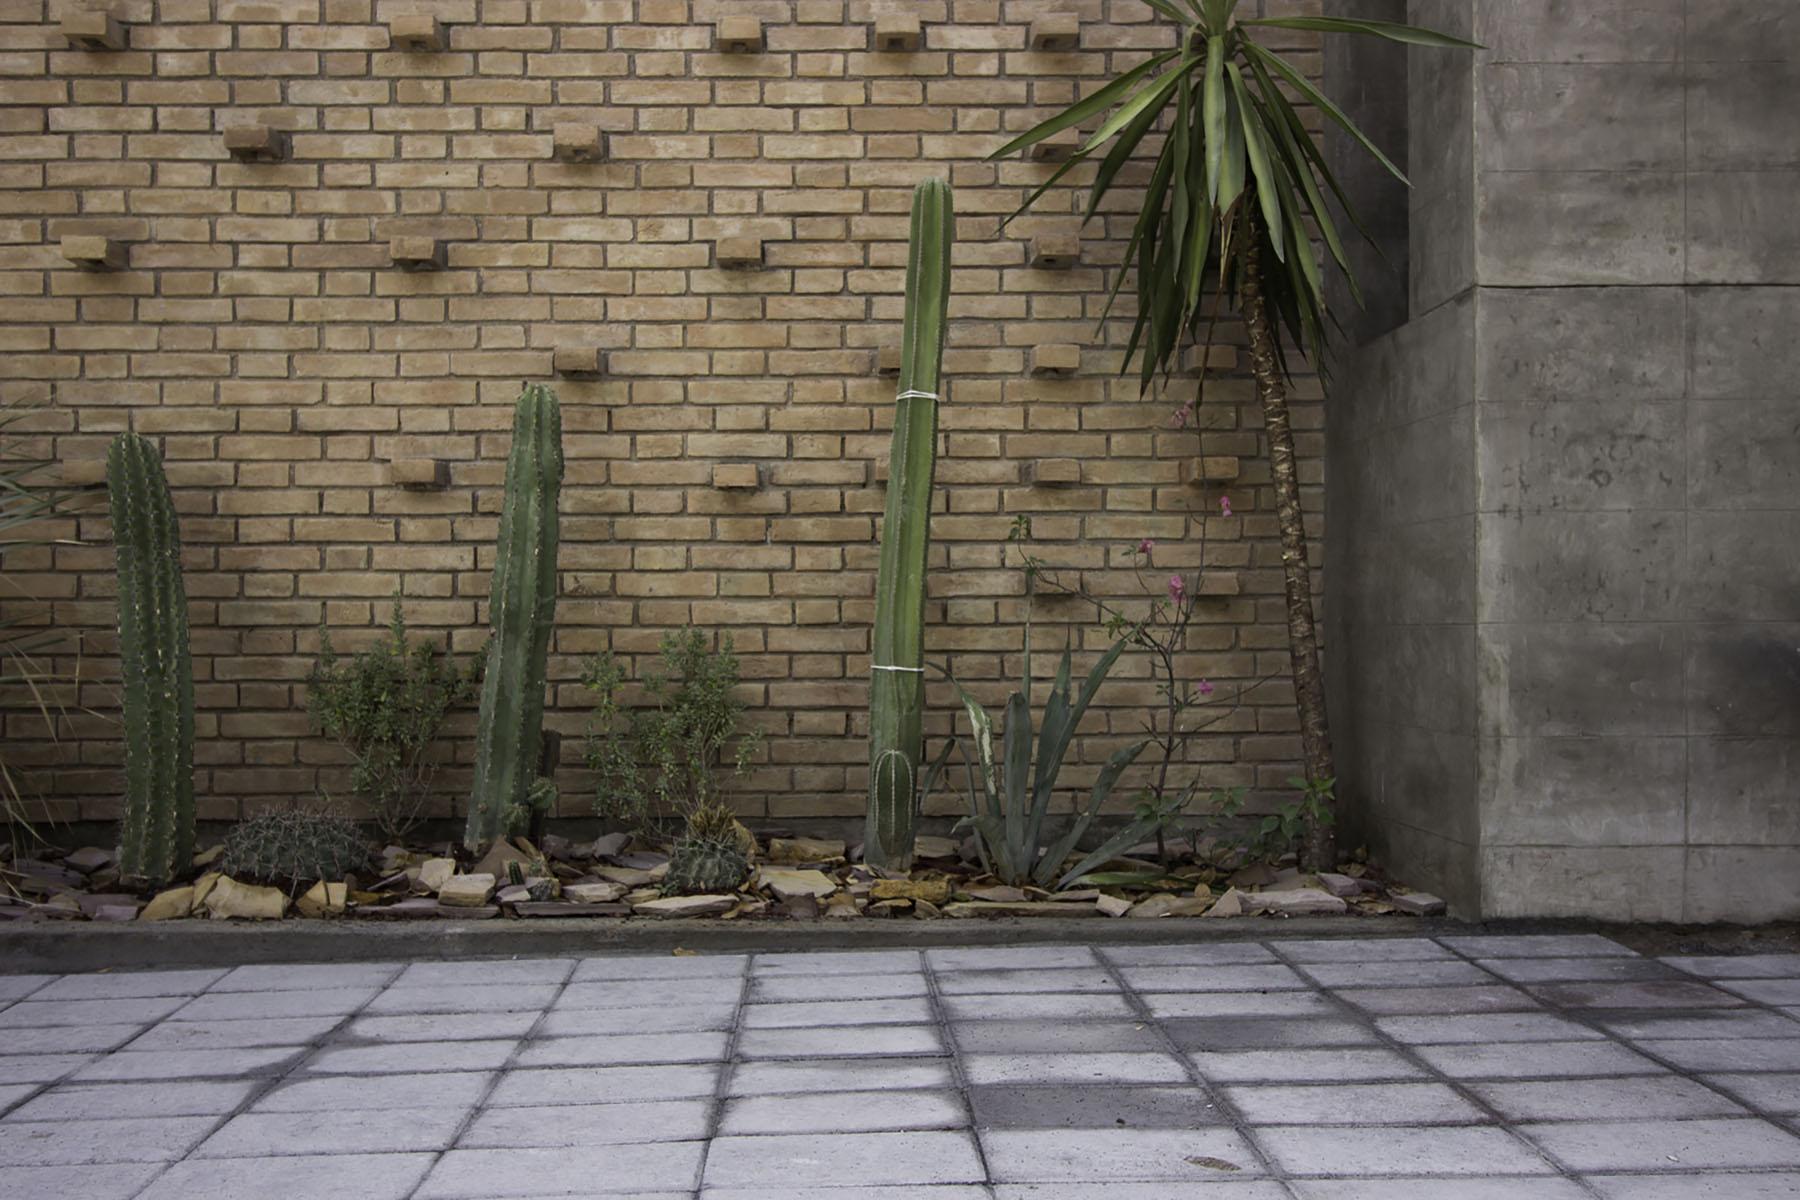 iGNANT-Architecture-Ariel-Valenzuela And-Diego-Ledesma -Casa-Papagayo-E